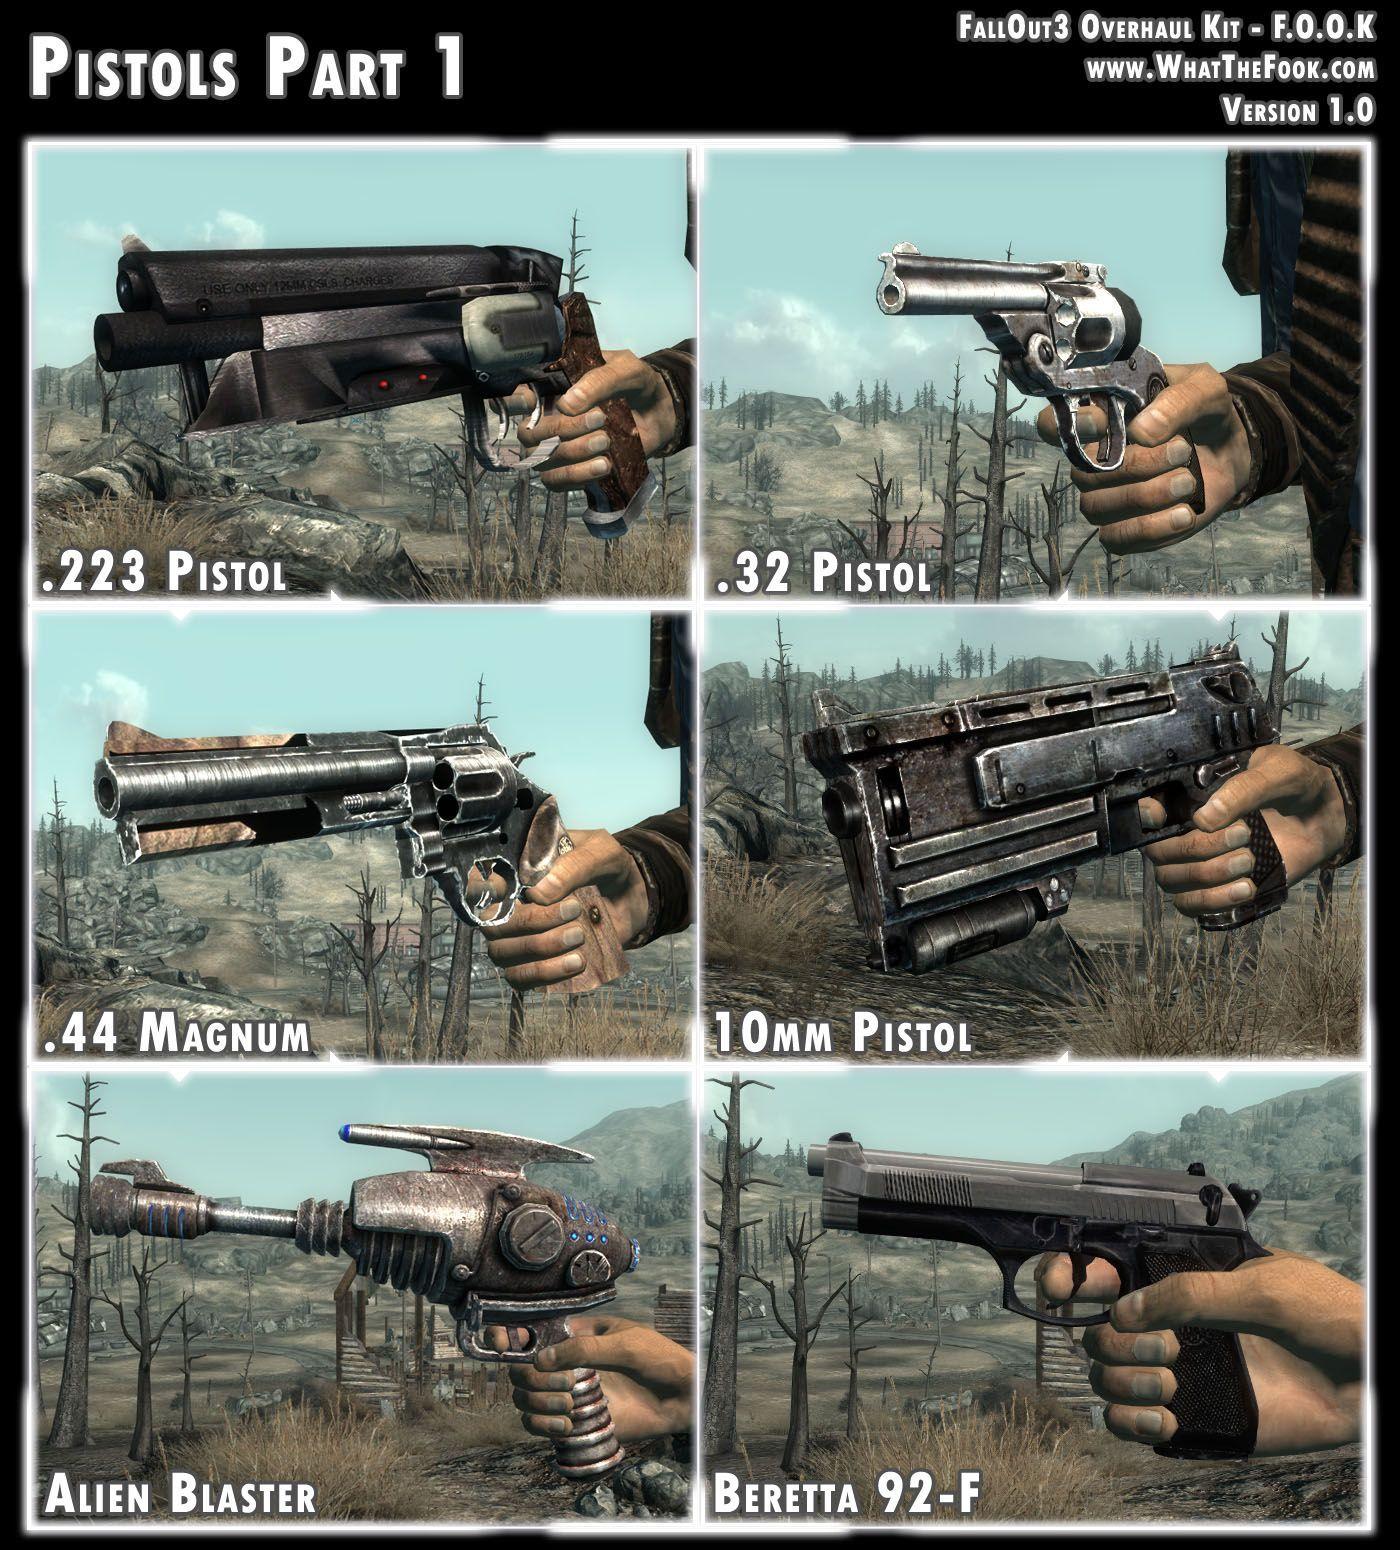 Fallout 3 Overhaul Kit Pistols Fallout New Vegas Fallout Cosplay Fallout Funny